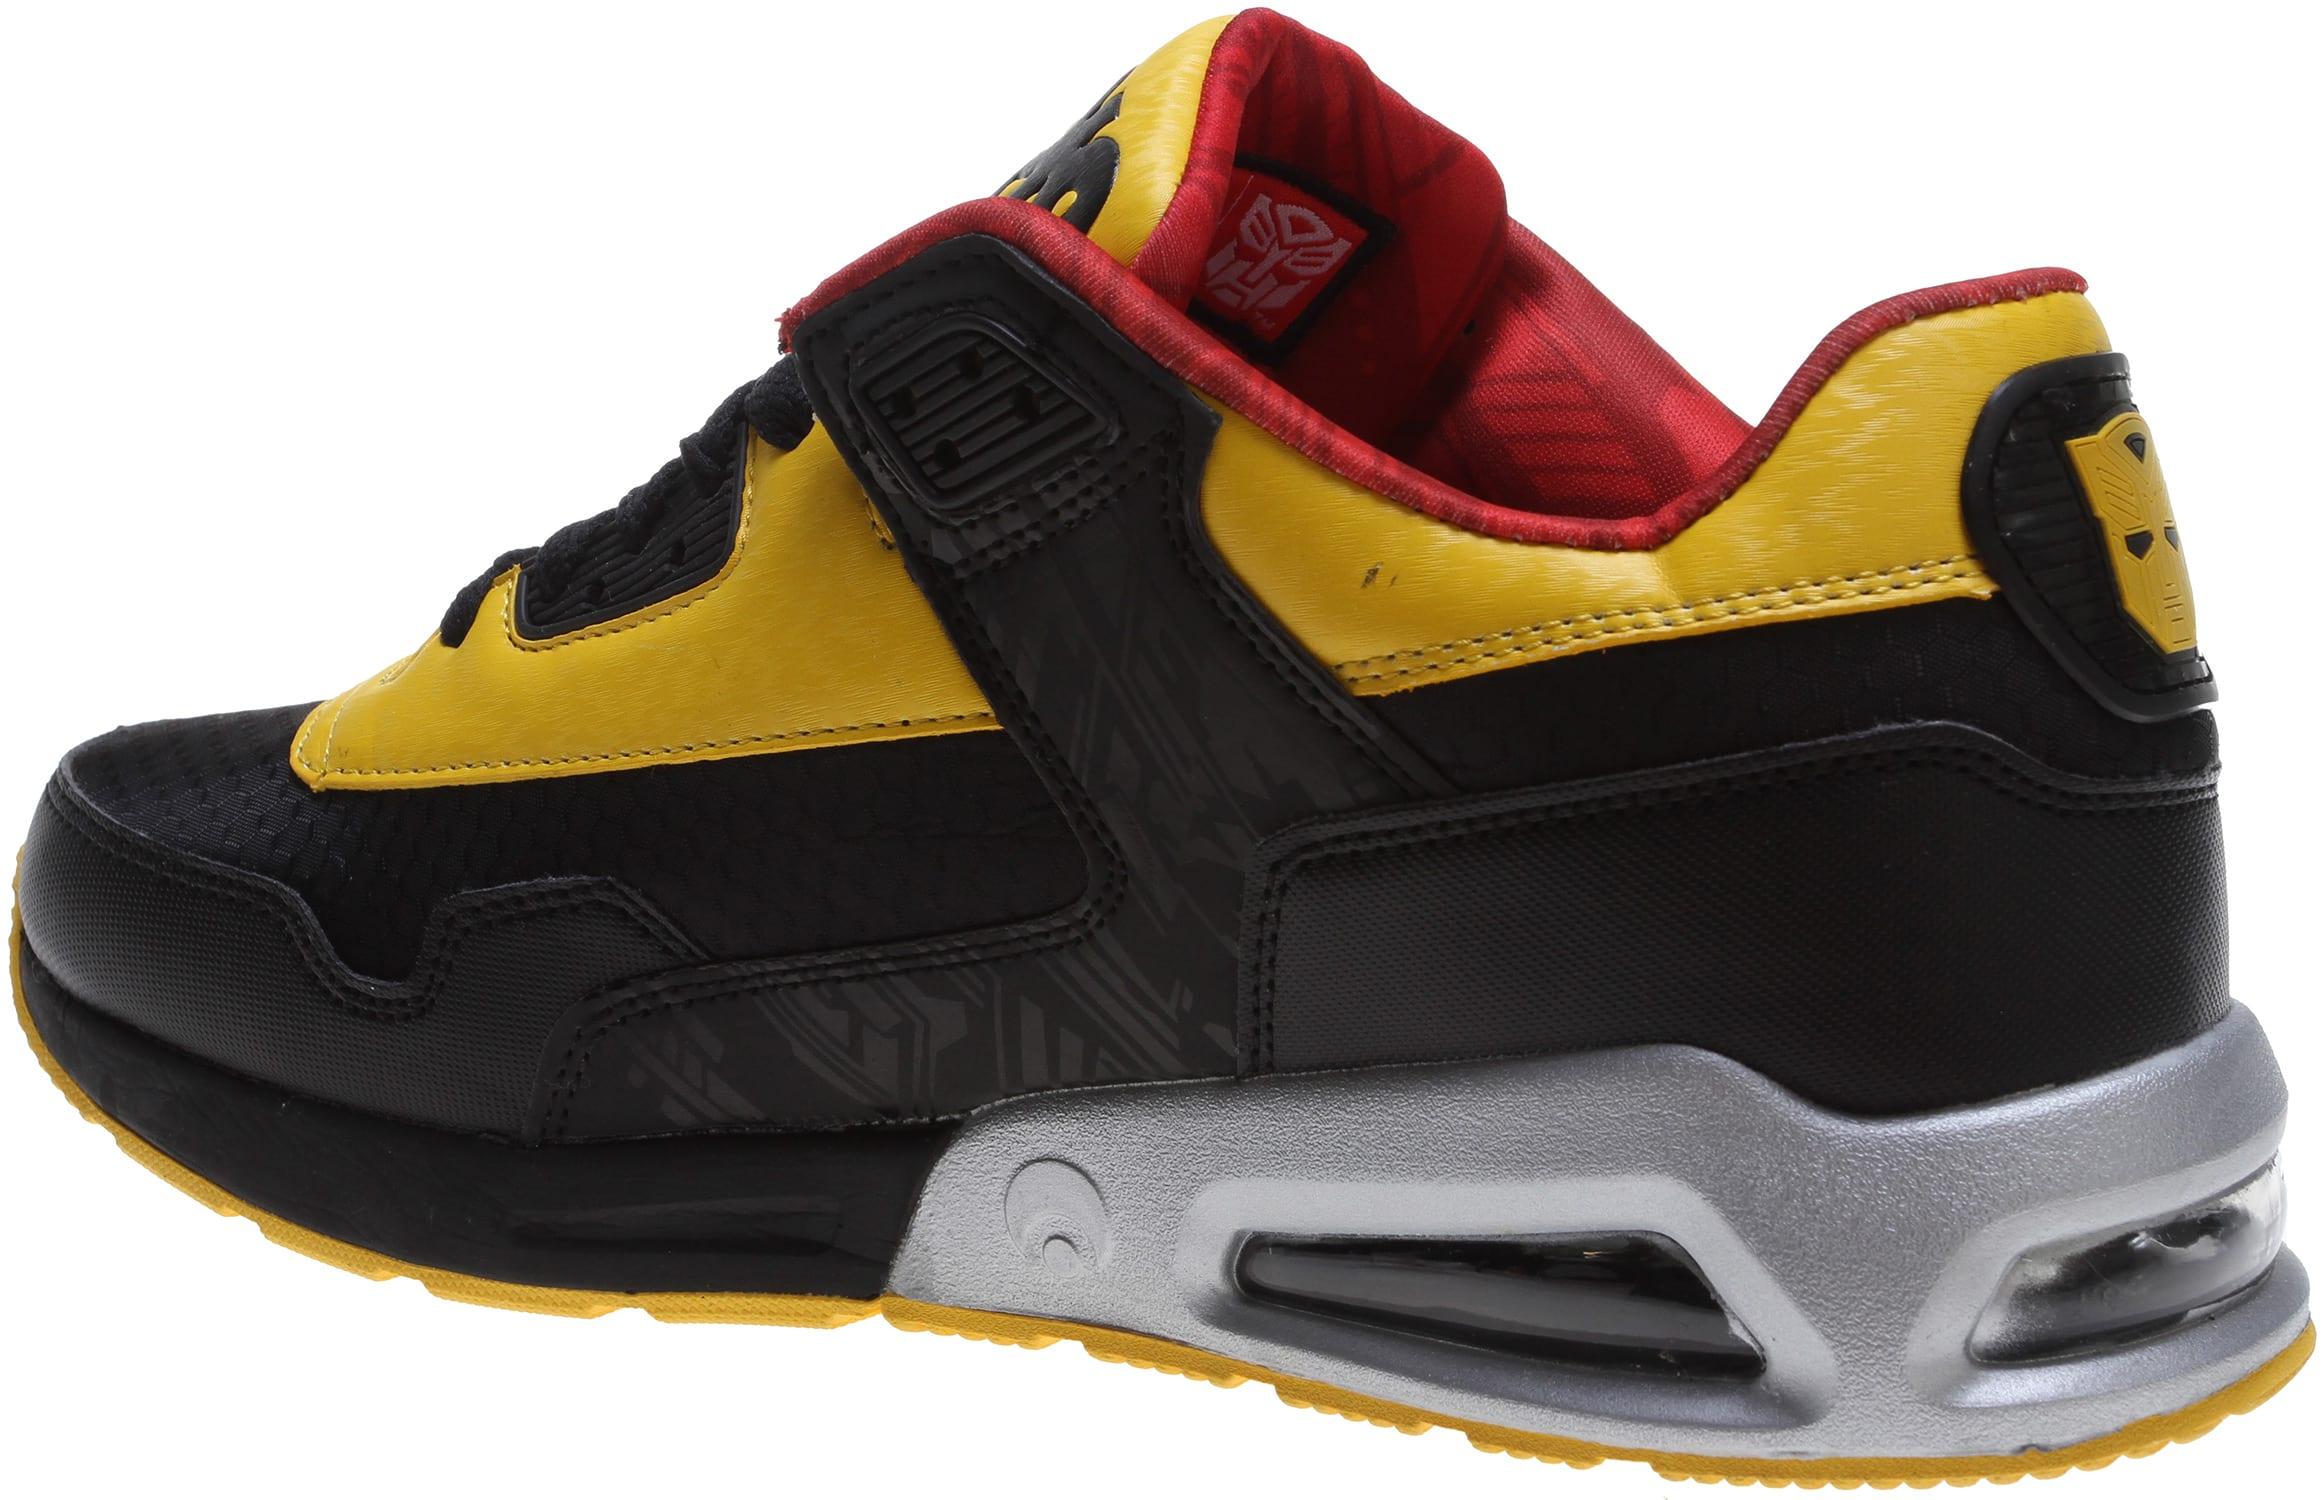 Osiris Uprise Skate Shoes - thumbnail 3